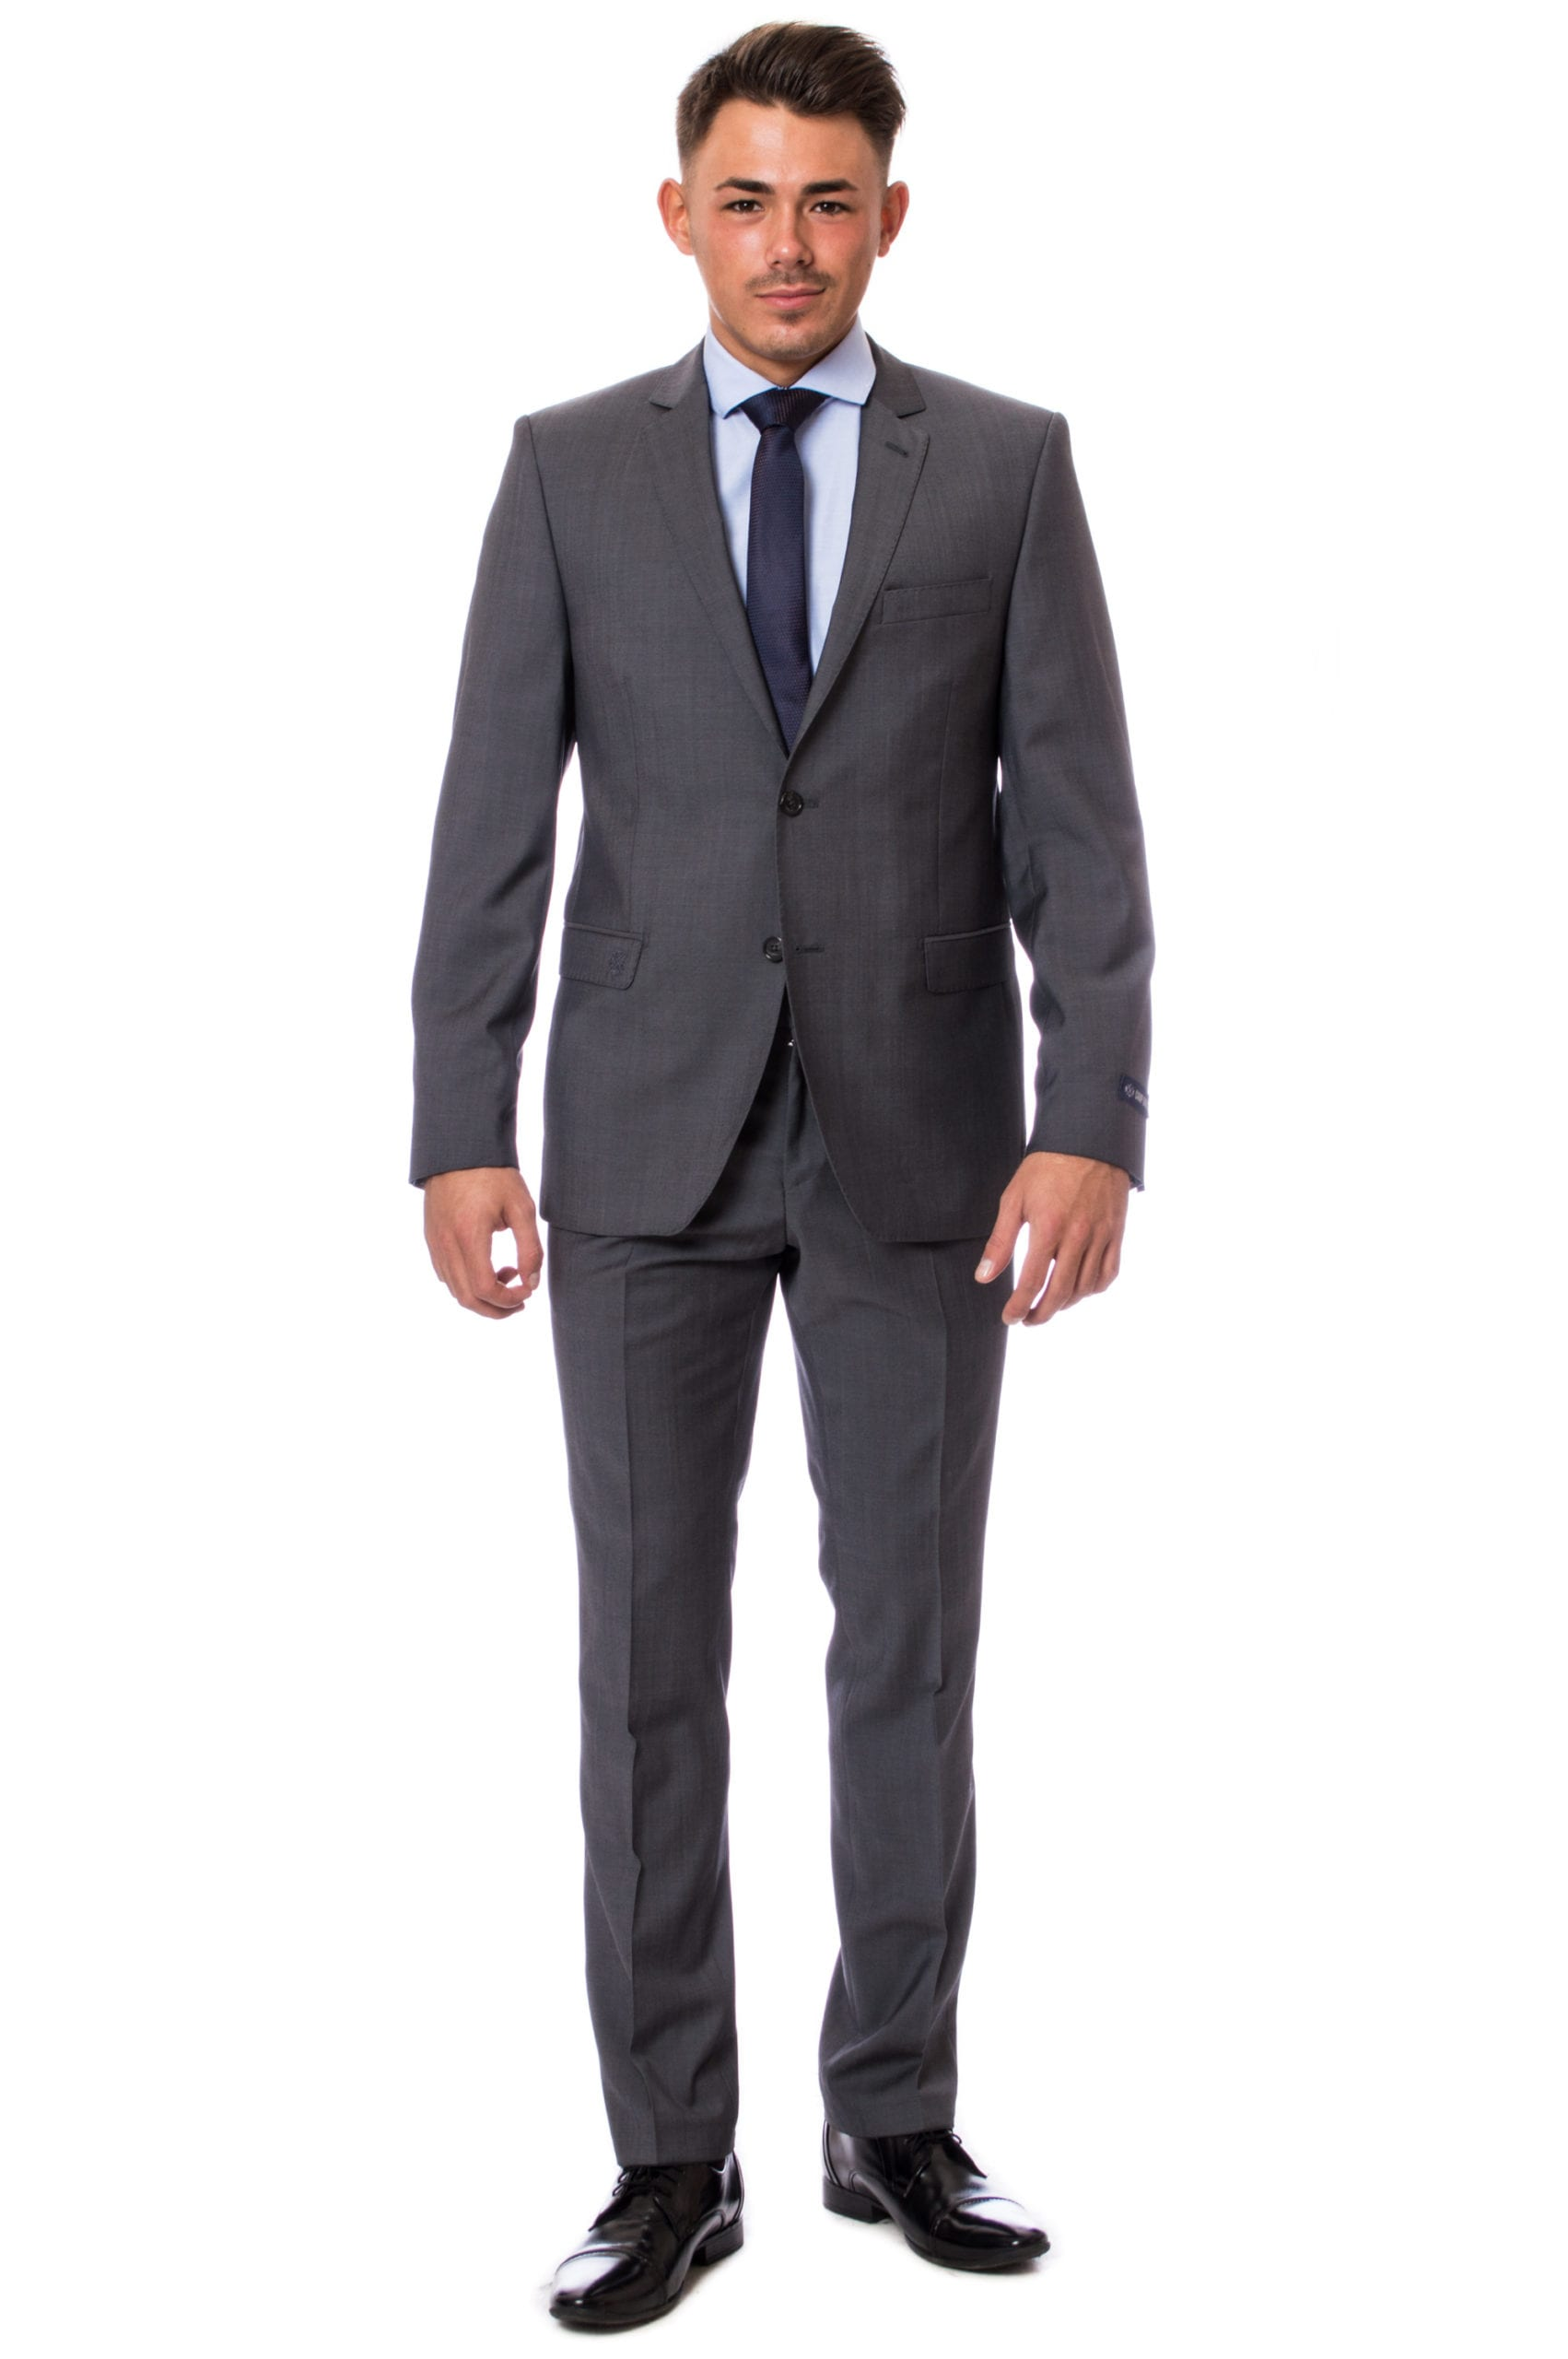 16dd06a5b5 Középszürke Gyapjú Slim Fit Öltöny - Elite Fashion Öltönyház